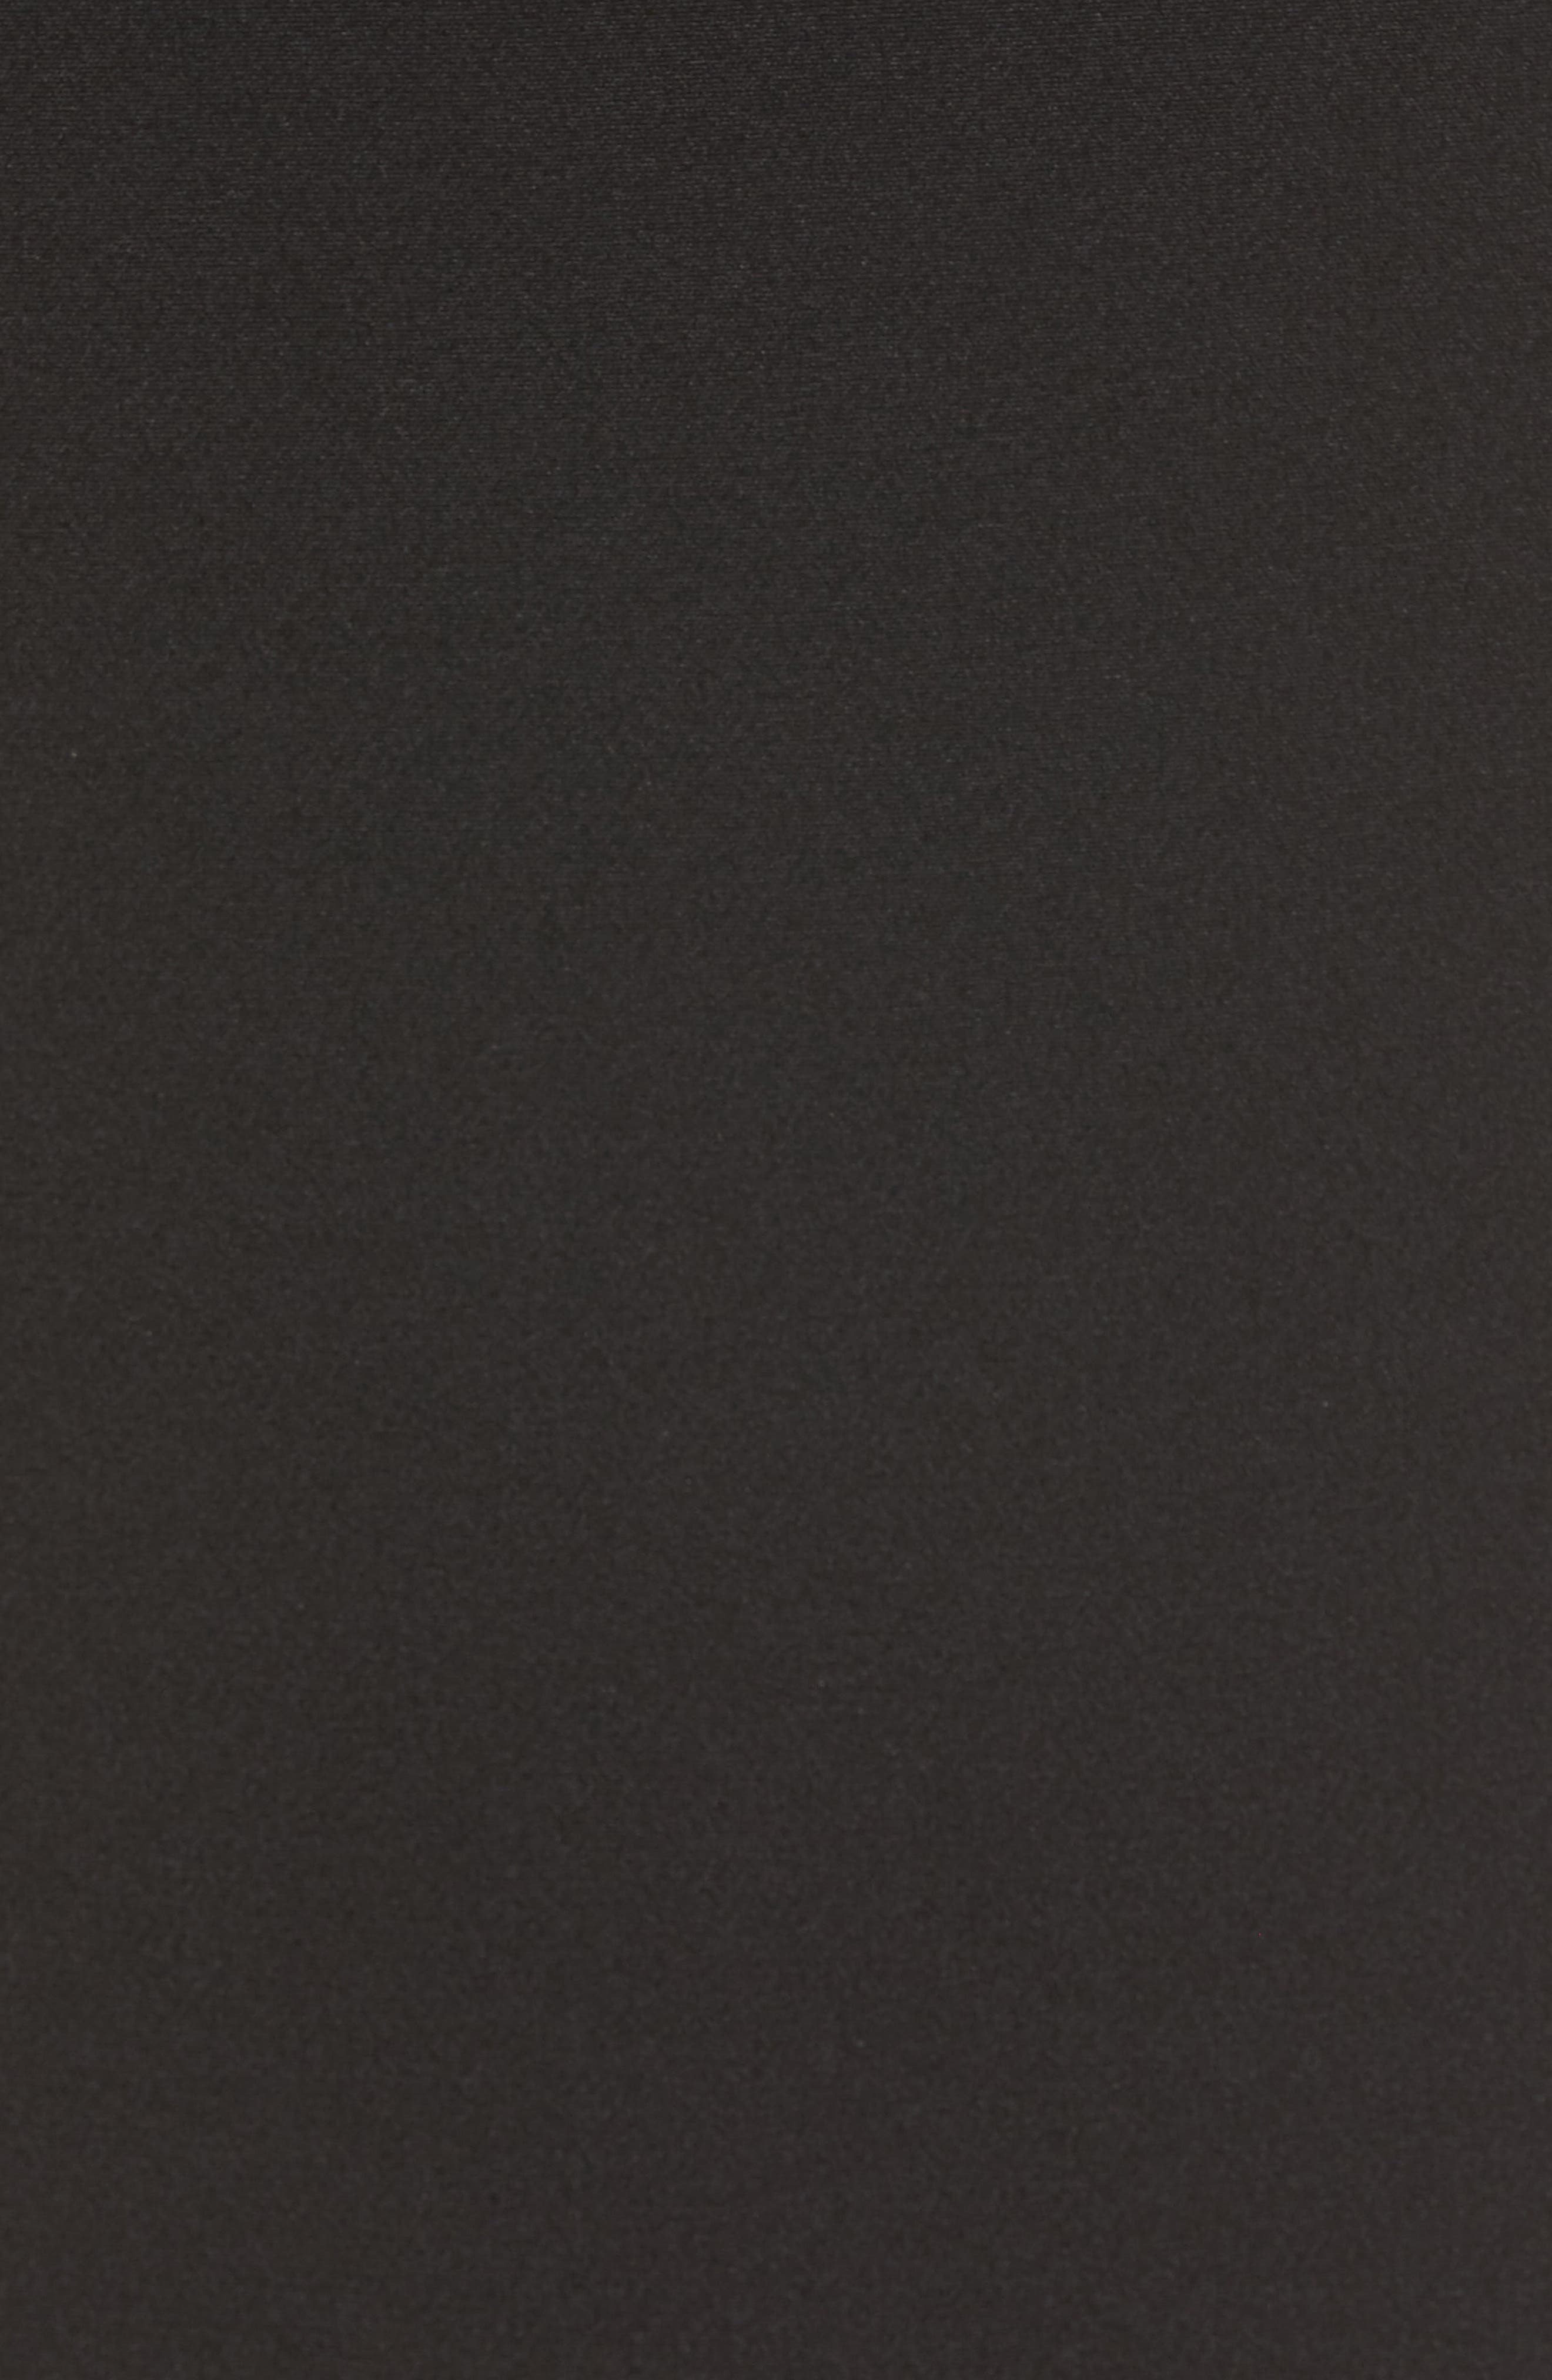 Ruffle Detail Pencil Skirt,                             Alternate thumbnail 5, color,                             001